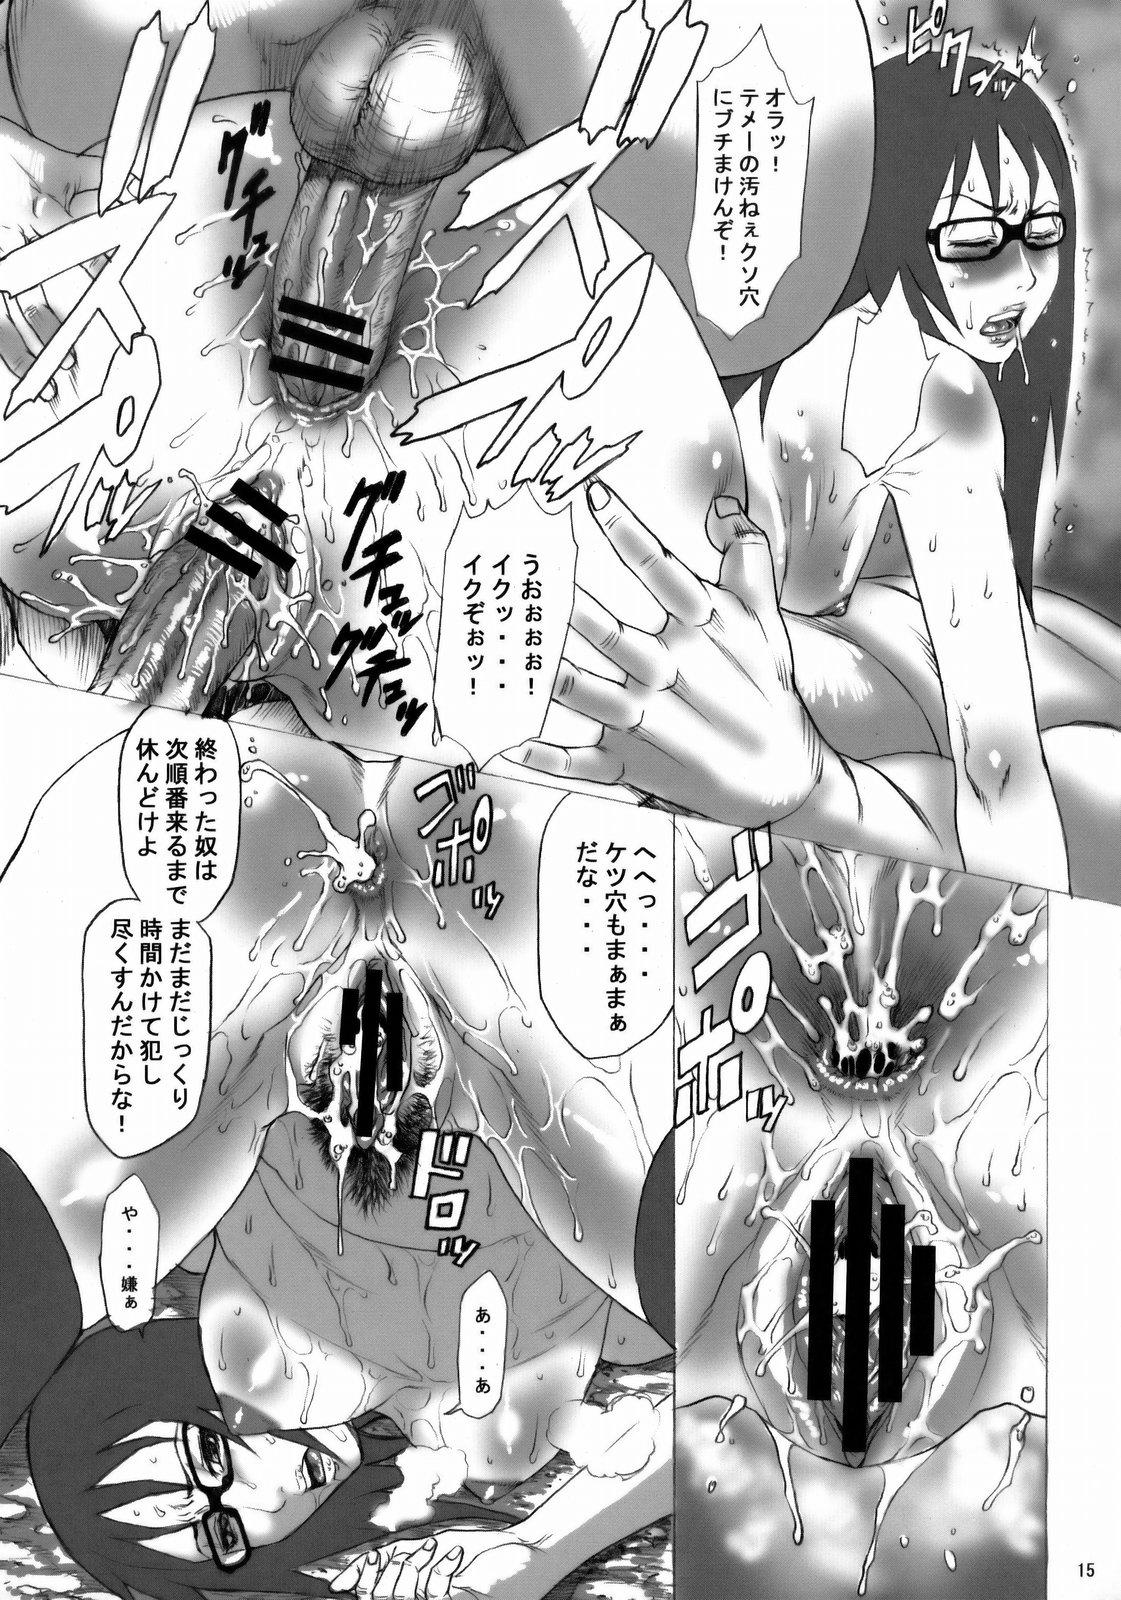 NINJA EXTREME 3 Onna Goroshi Shippuuden 13